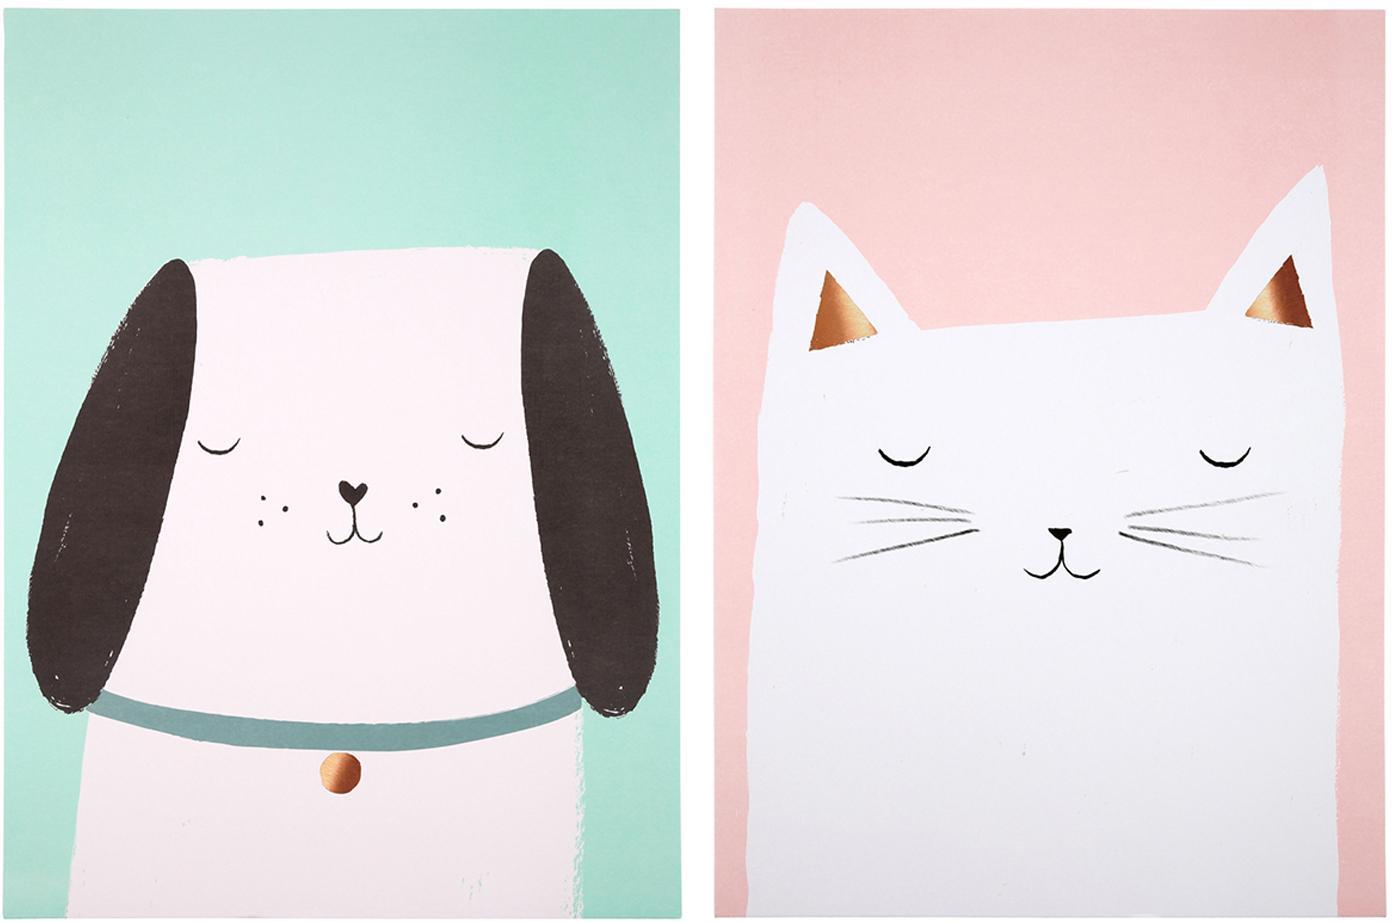 Postersset Cat & Dog, 2-delig, Digitale print op papier, 200 g/m², Roze, groen, wit, zwart, 31 x 41 cm